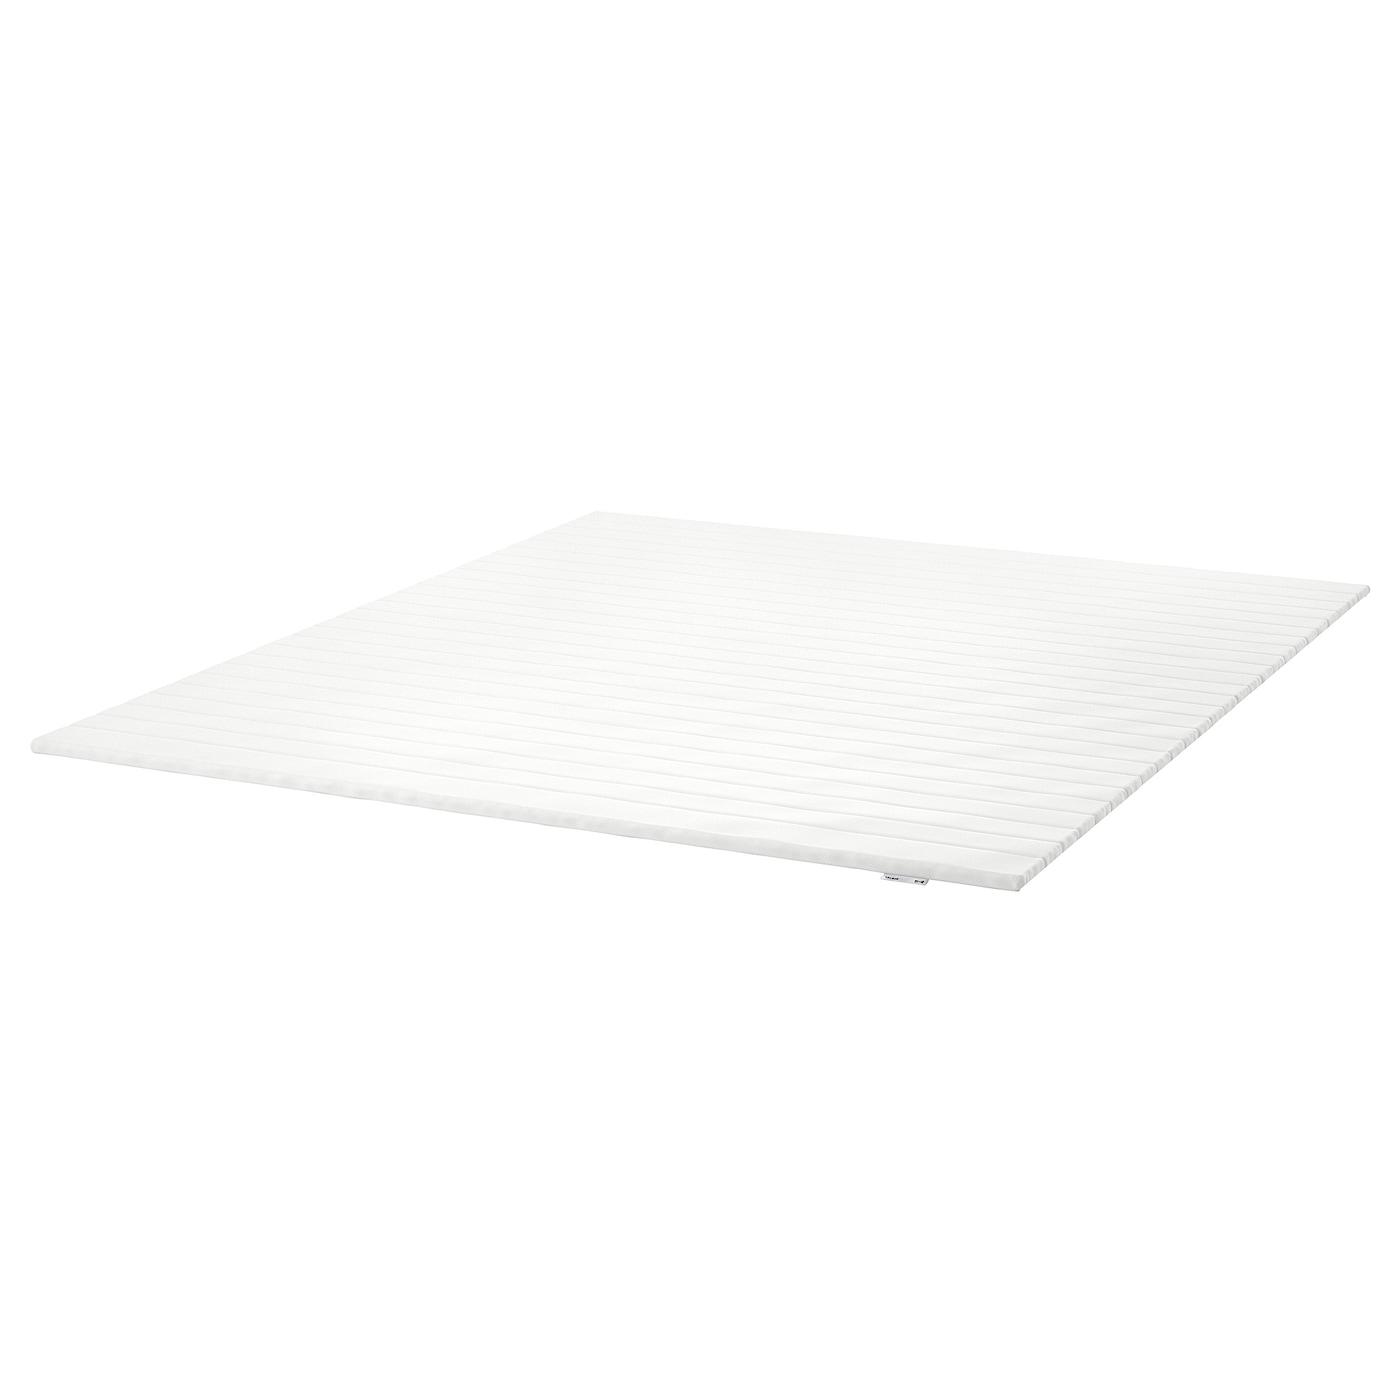 talgje surmatelas blanc 160 x 200 cm ikea. Black Bedroom Furniture Sets. Home Design Ideas